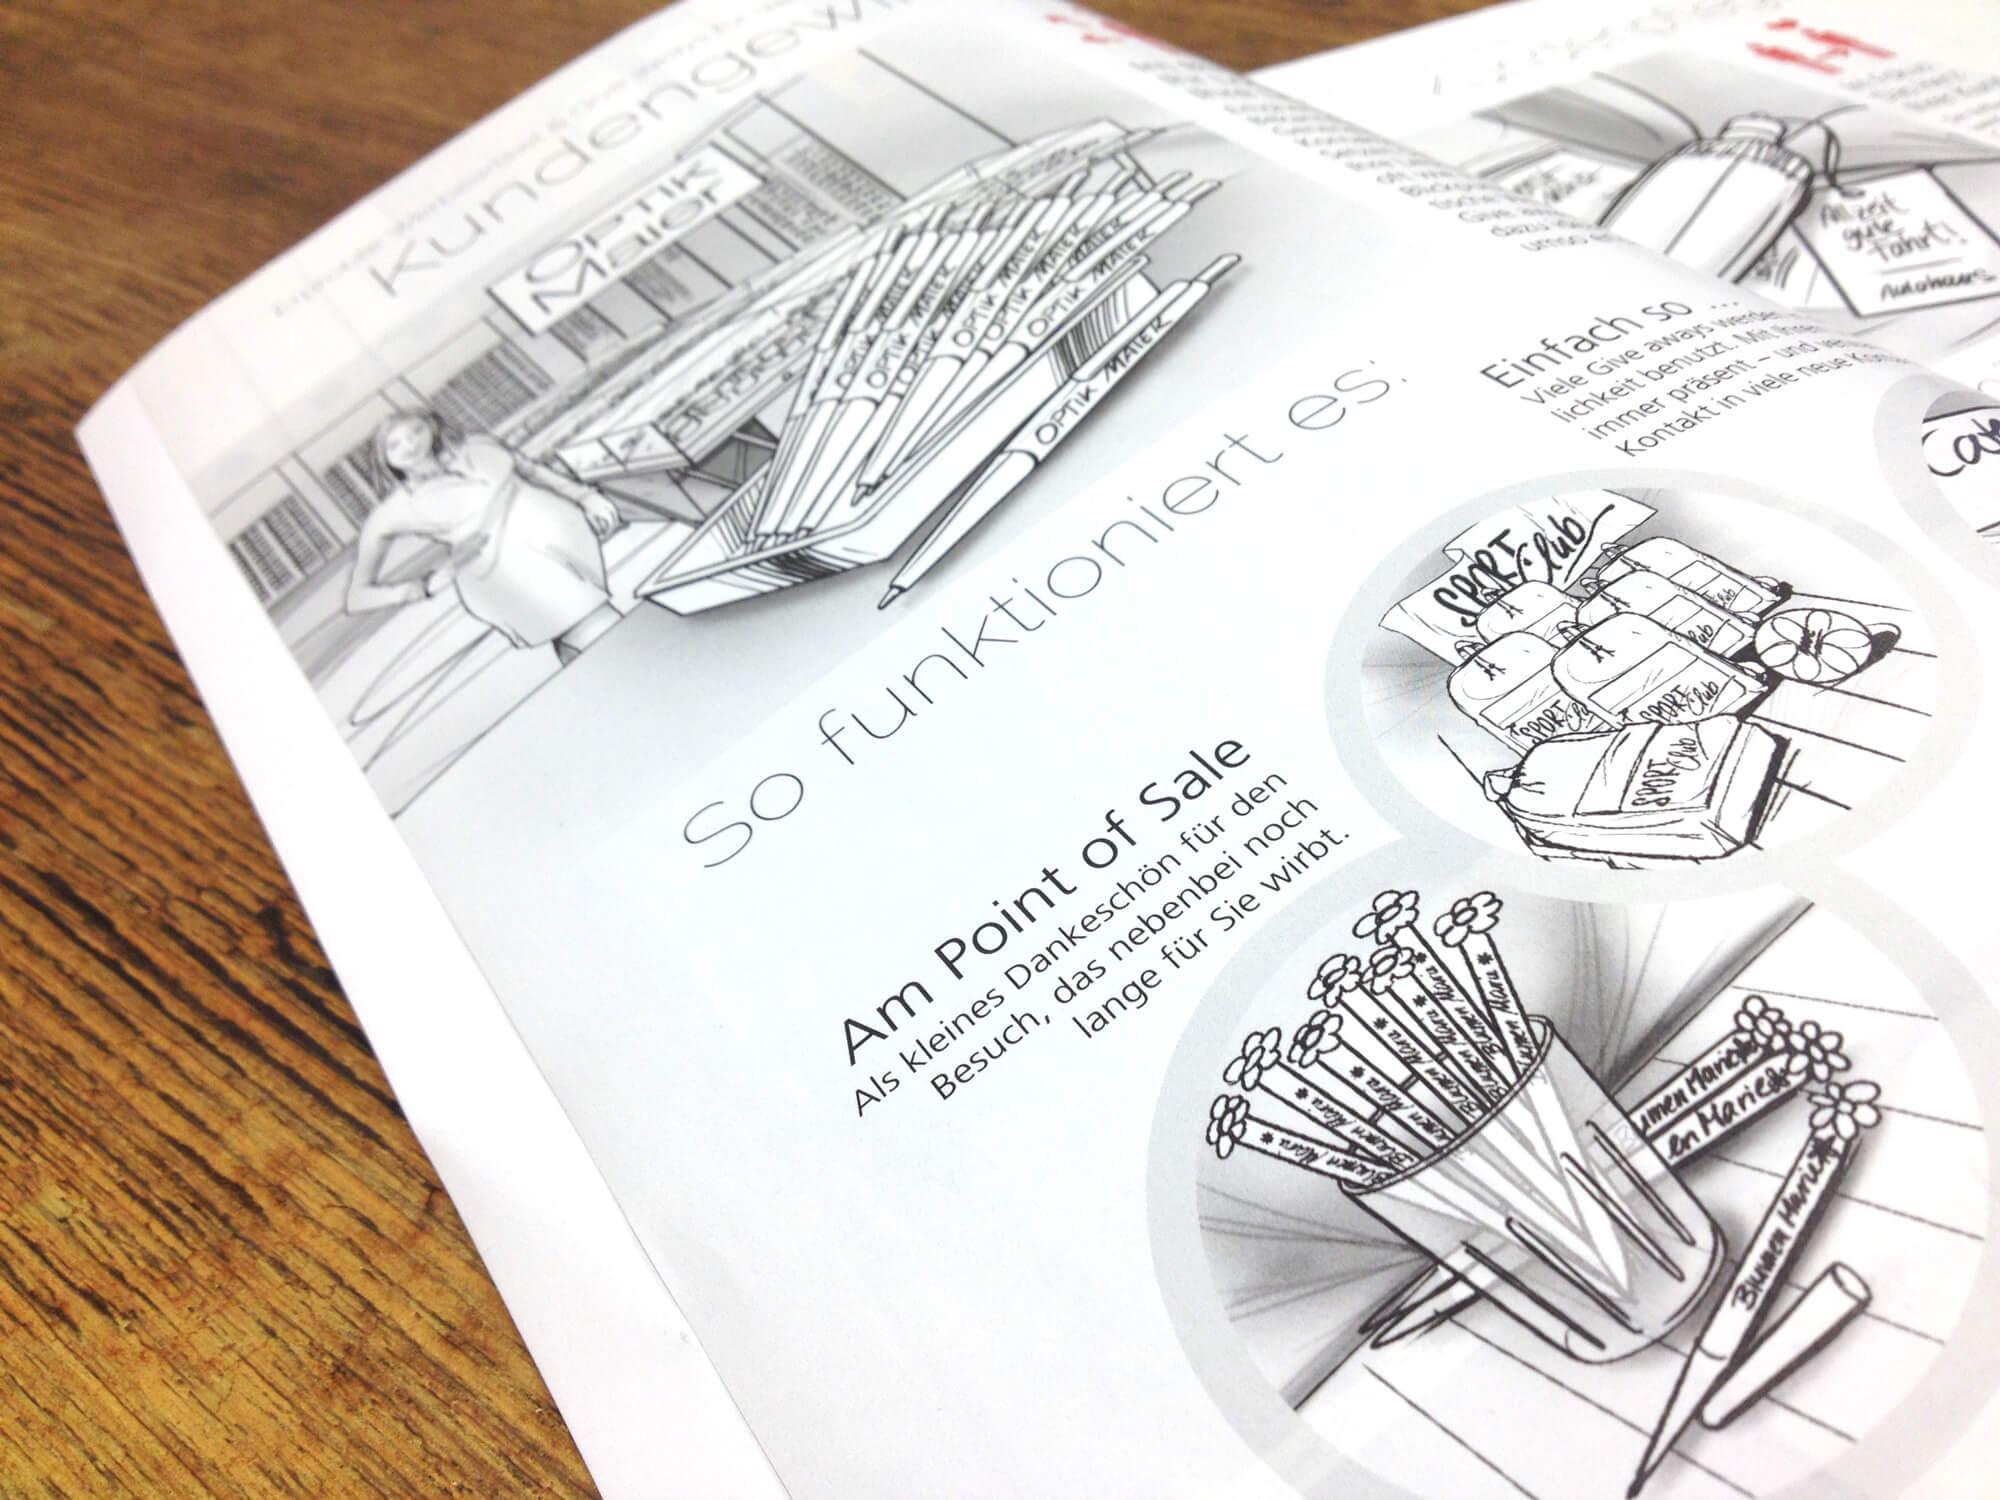 hach katalog herbst 2015 bzweic. Black Bedroom Furniture Sets. Home Design Ideas